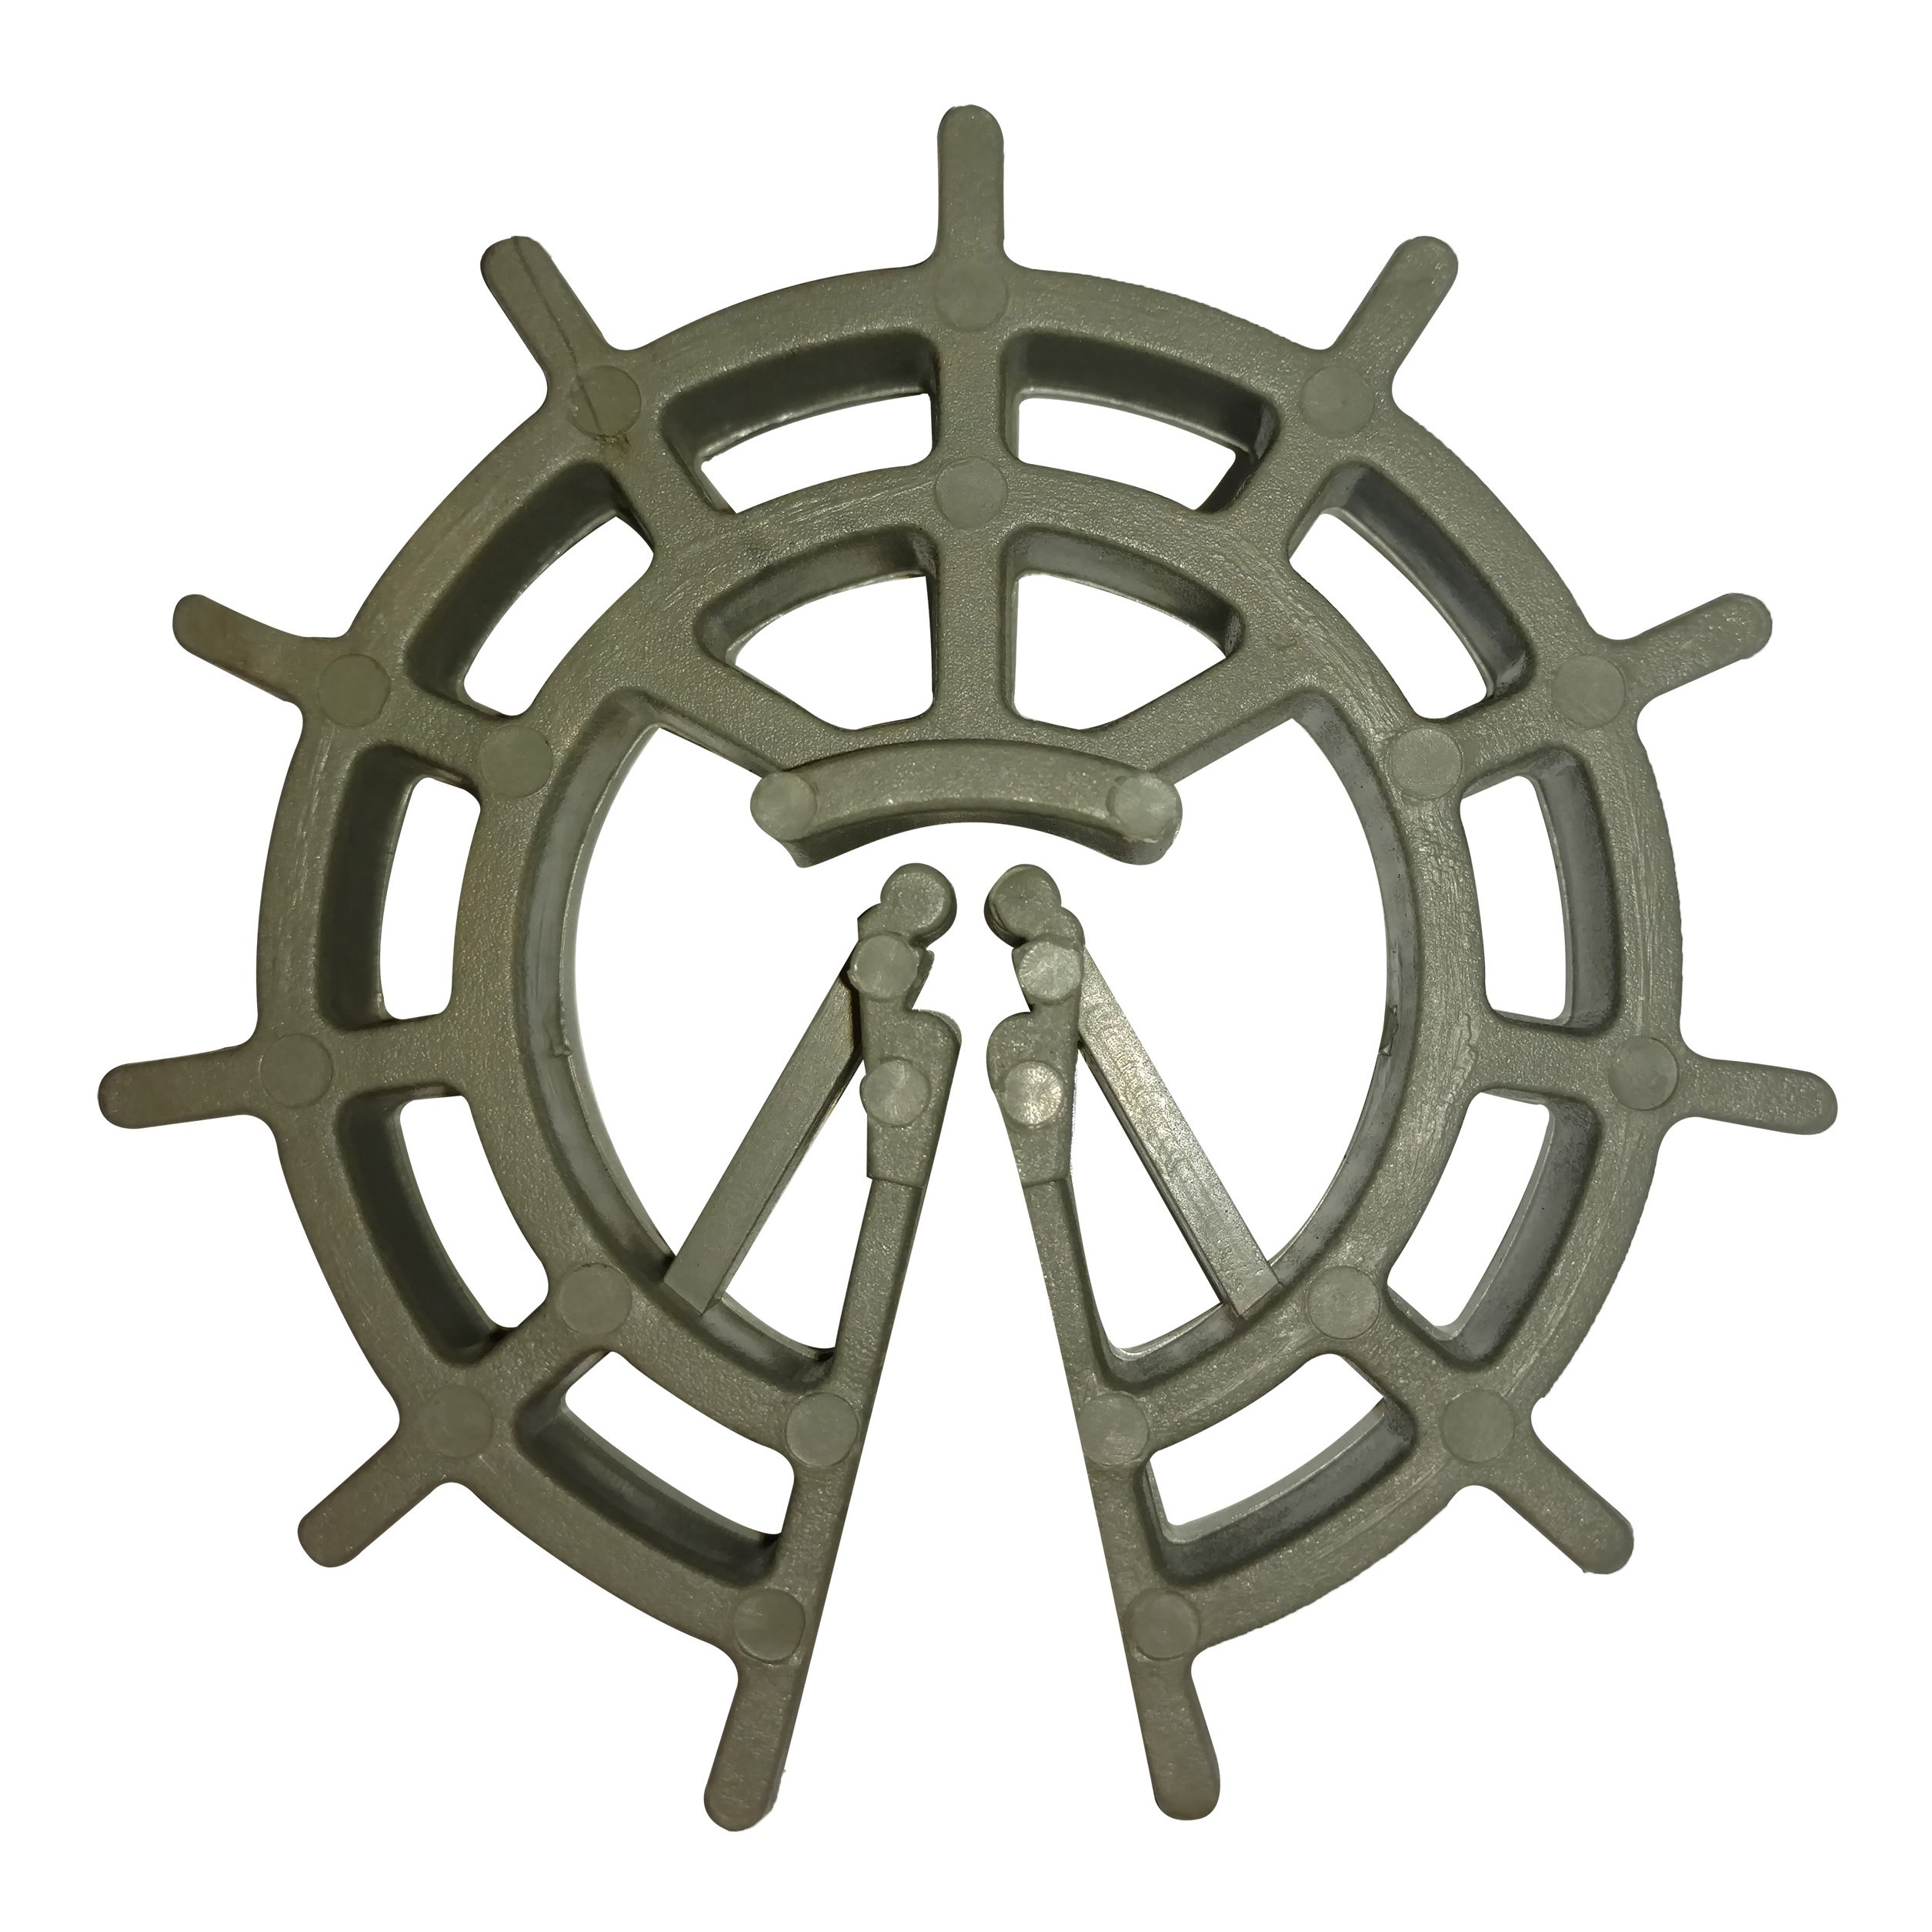 1-1/2'' Rebar/Rerod/Wire Mesh Plastic Spacer Wheel - #3, #4 Bar - 1,000 Ct.